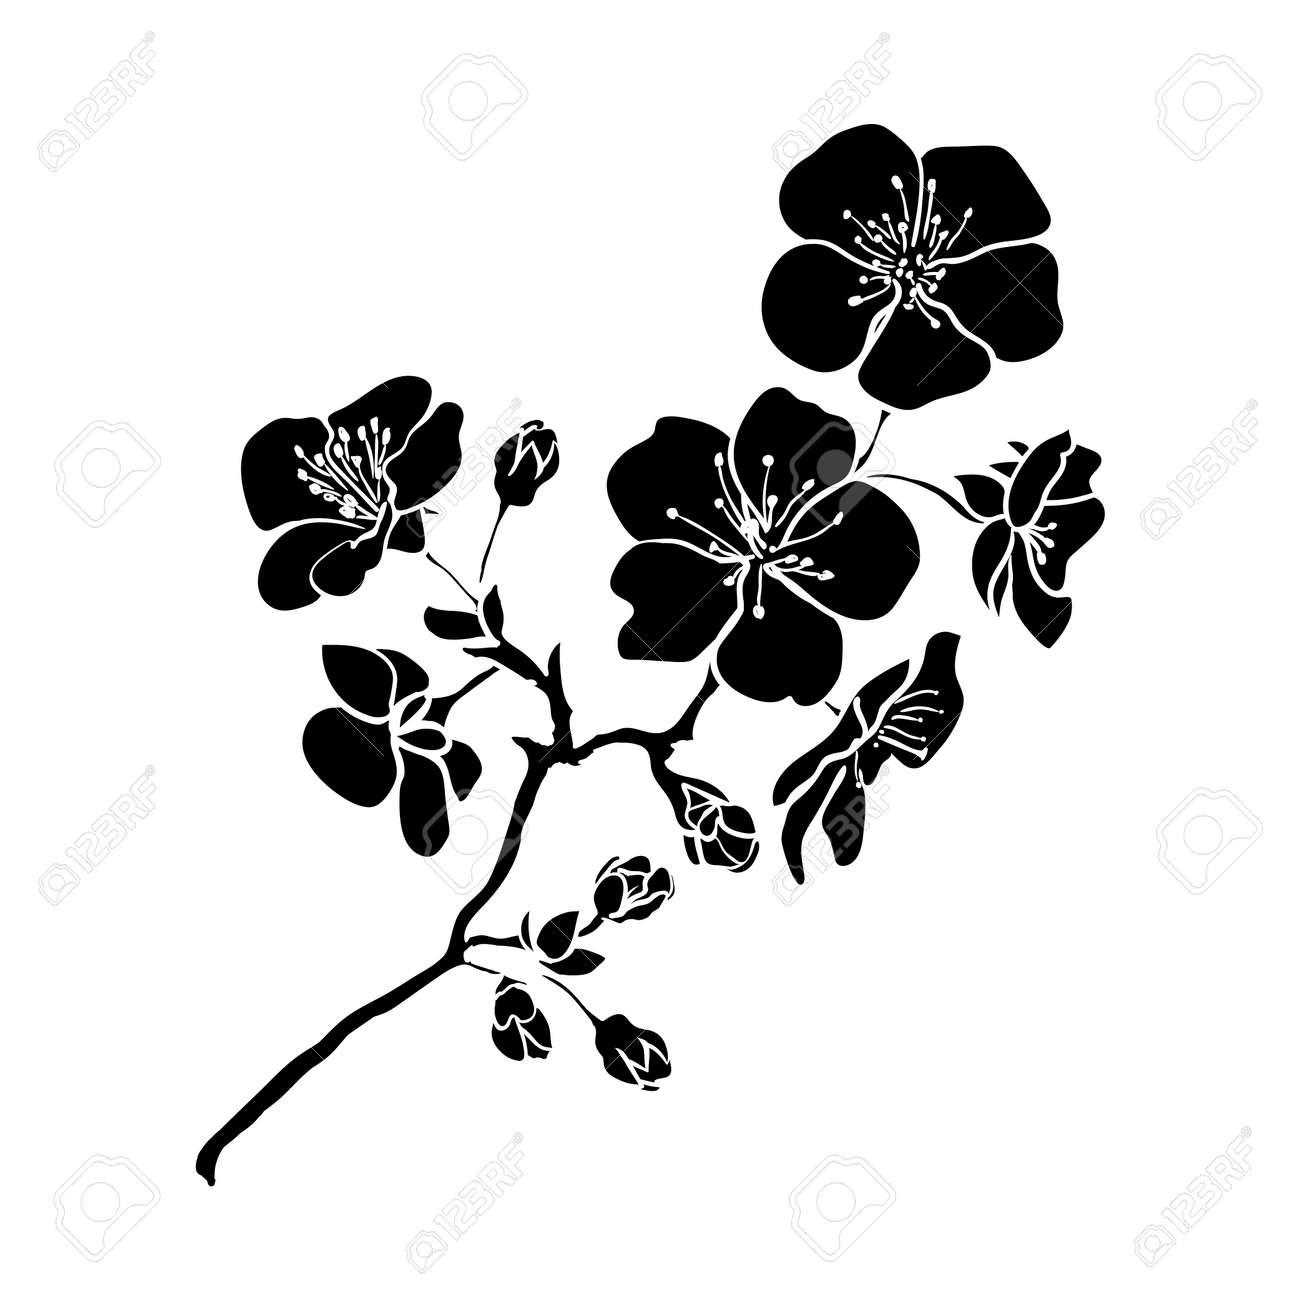 twig sakura blossoms. Vector illustration. Black outline - 37747514